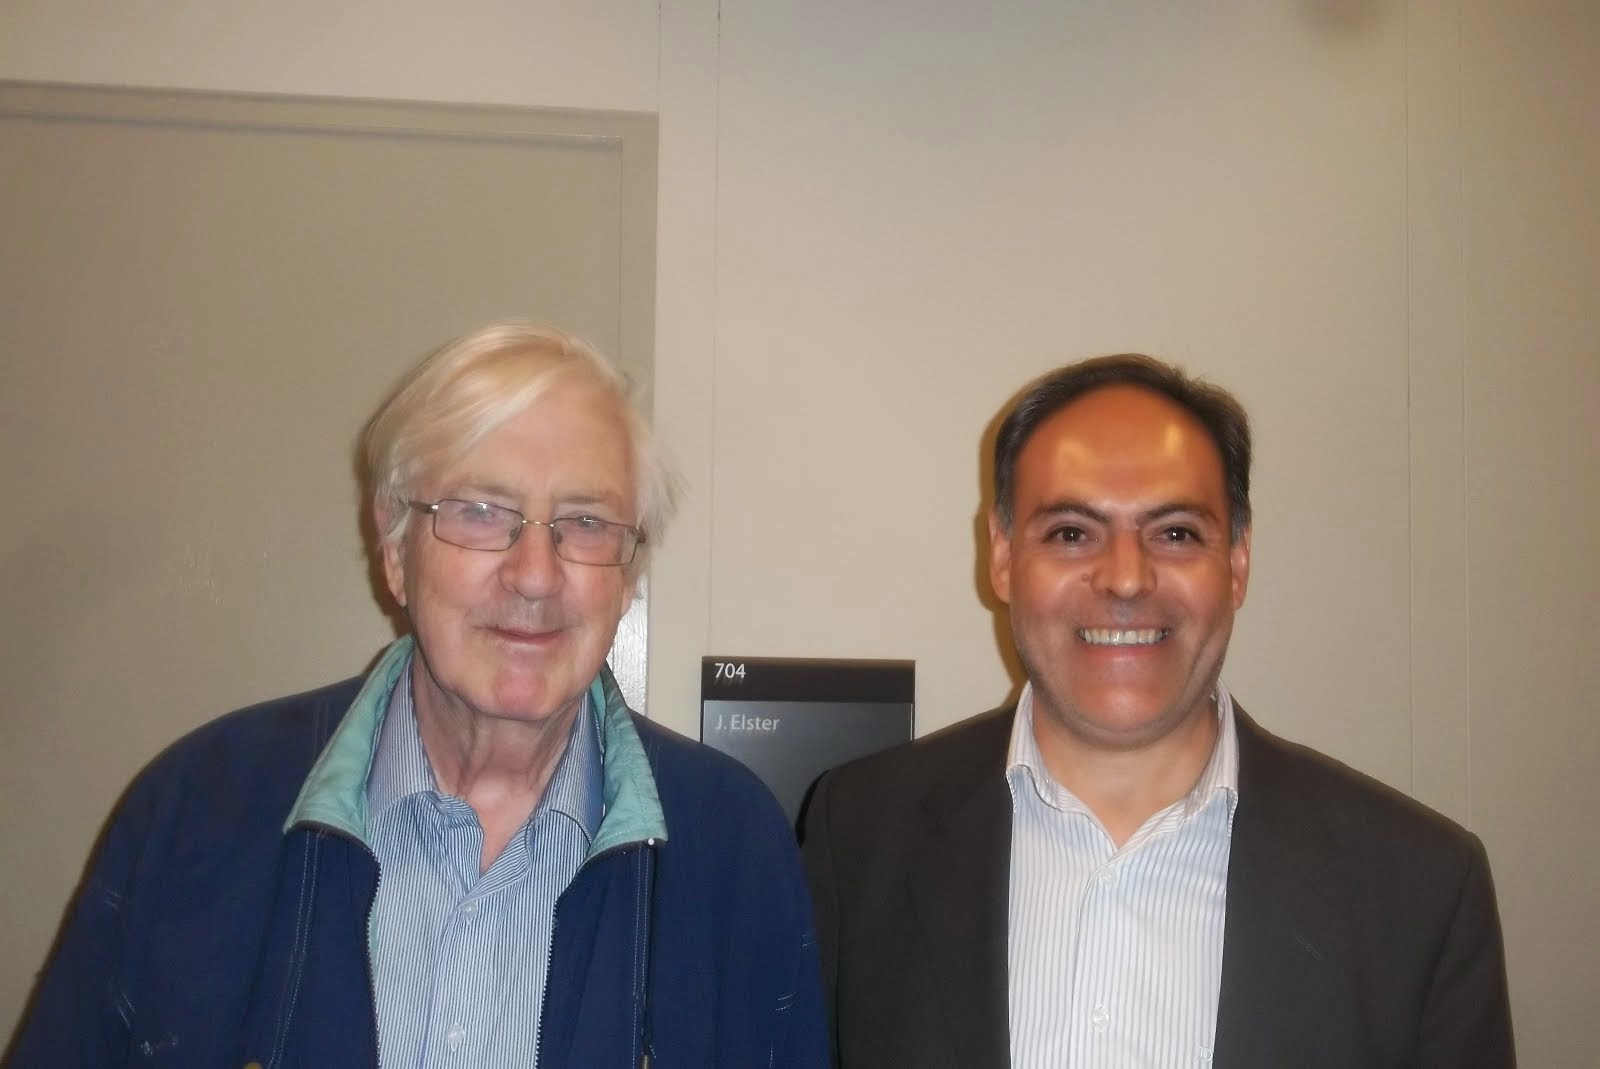 Con el Profesor John Elster